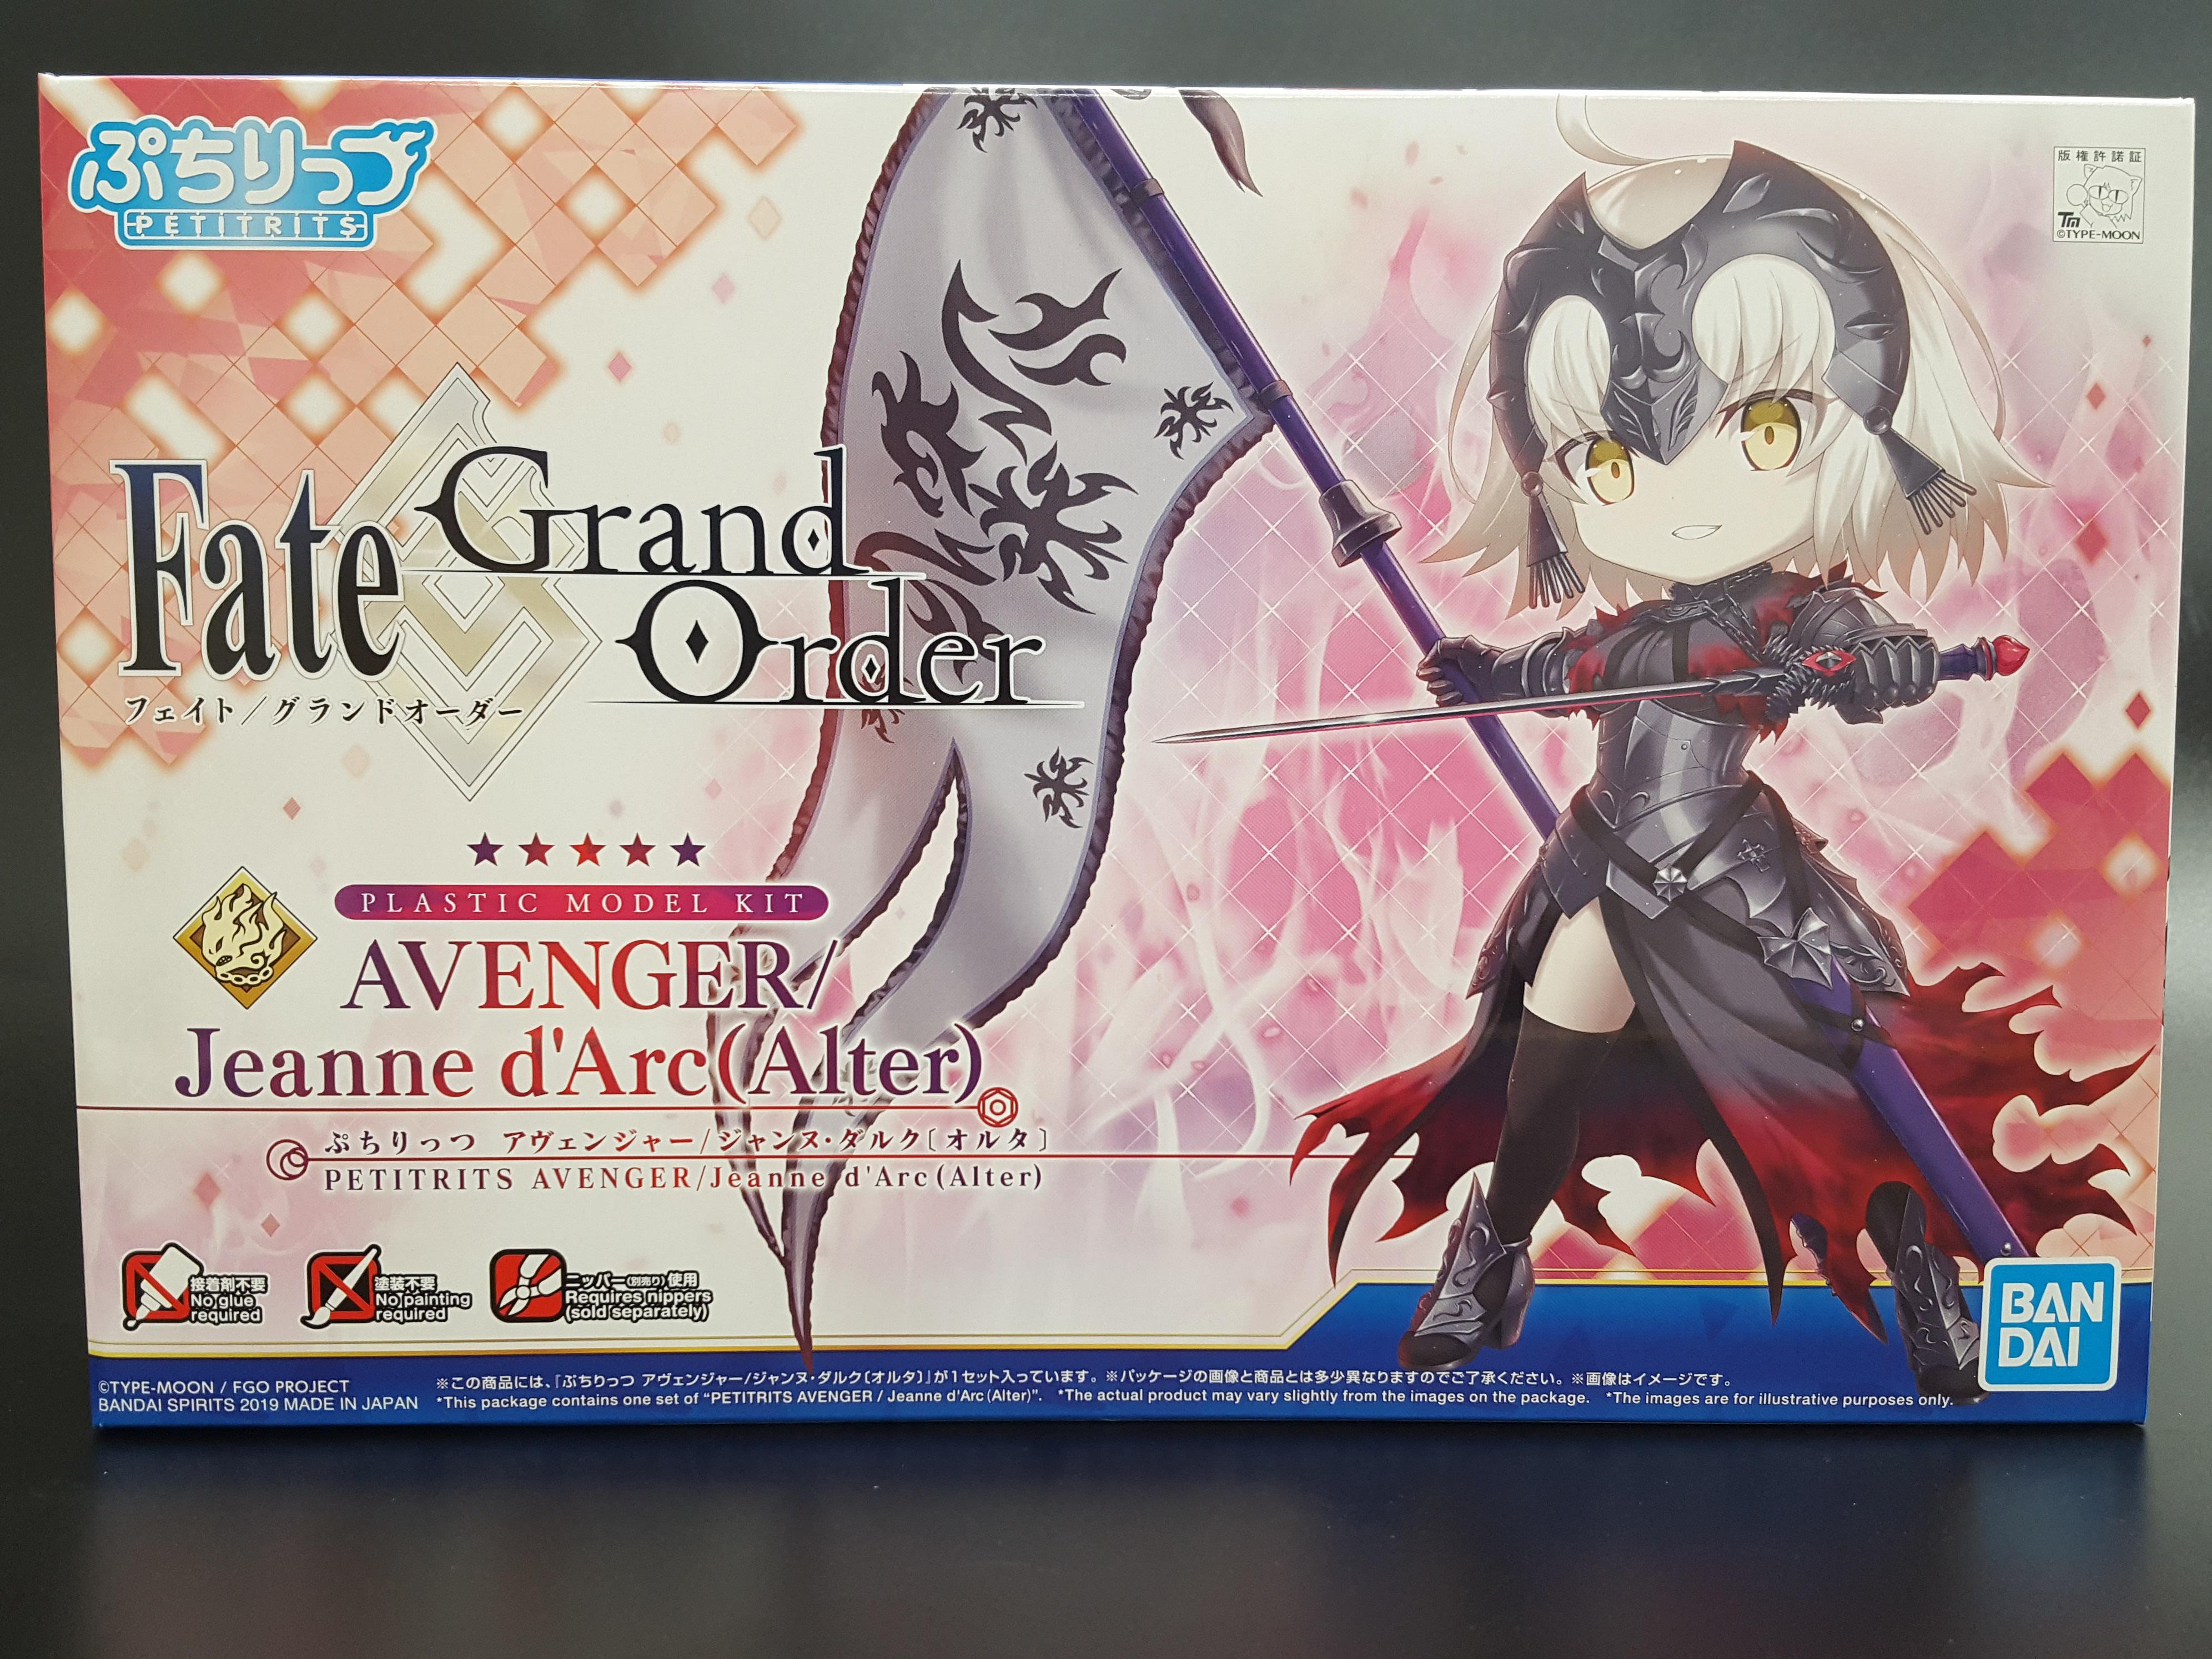 Petitrits Avenger Jeanne d'Arc (Alter) (Fate/Grand Order)